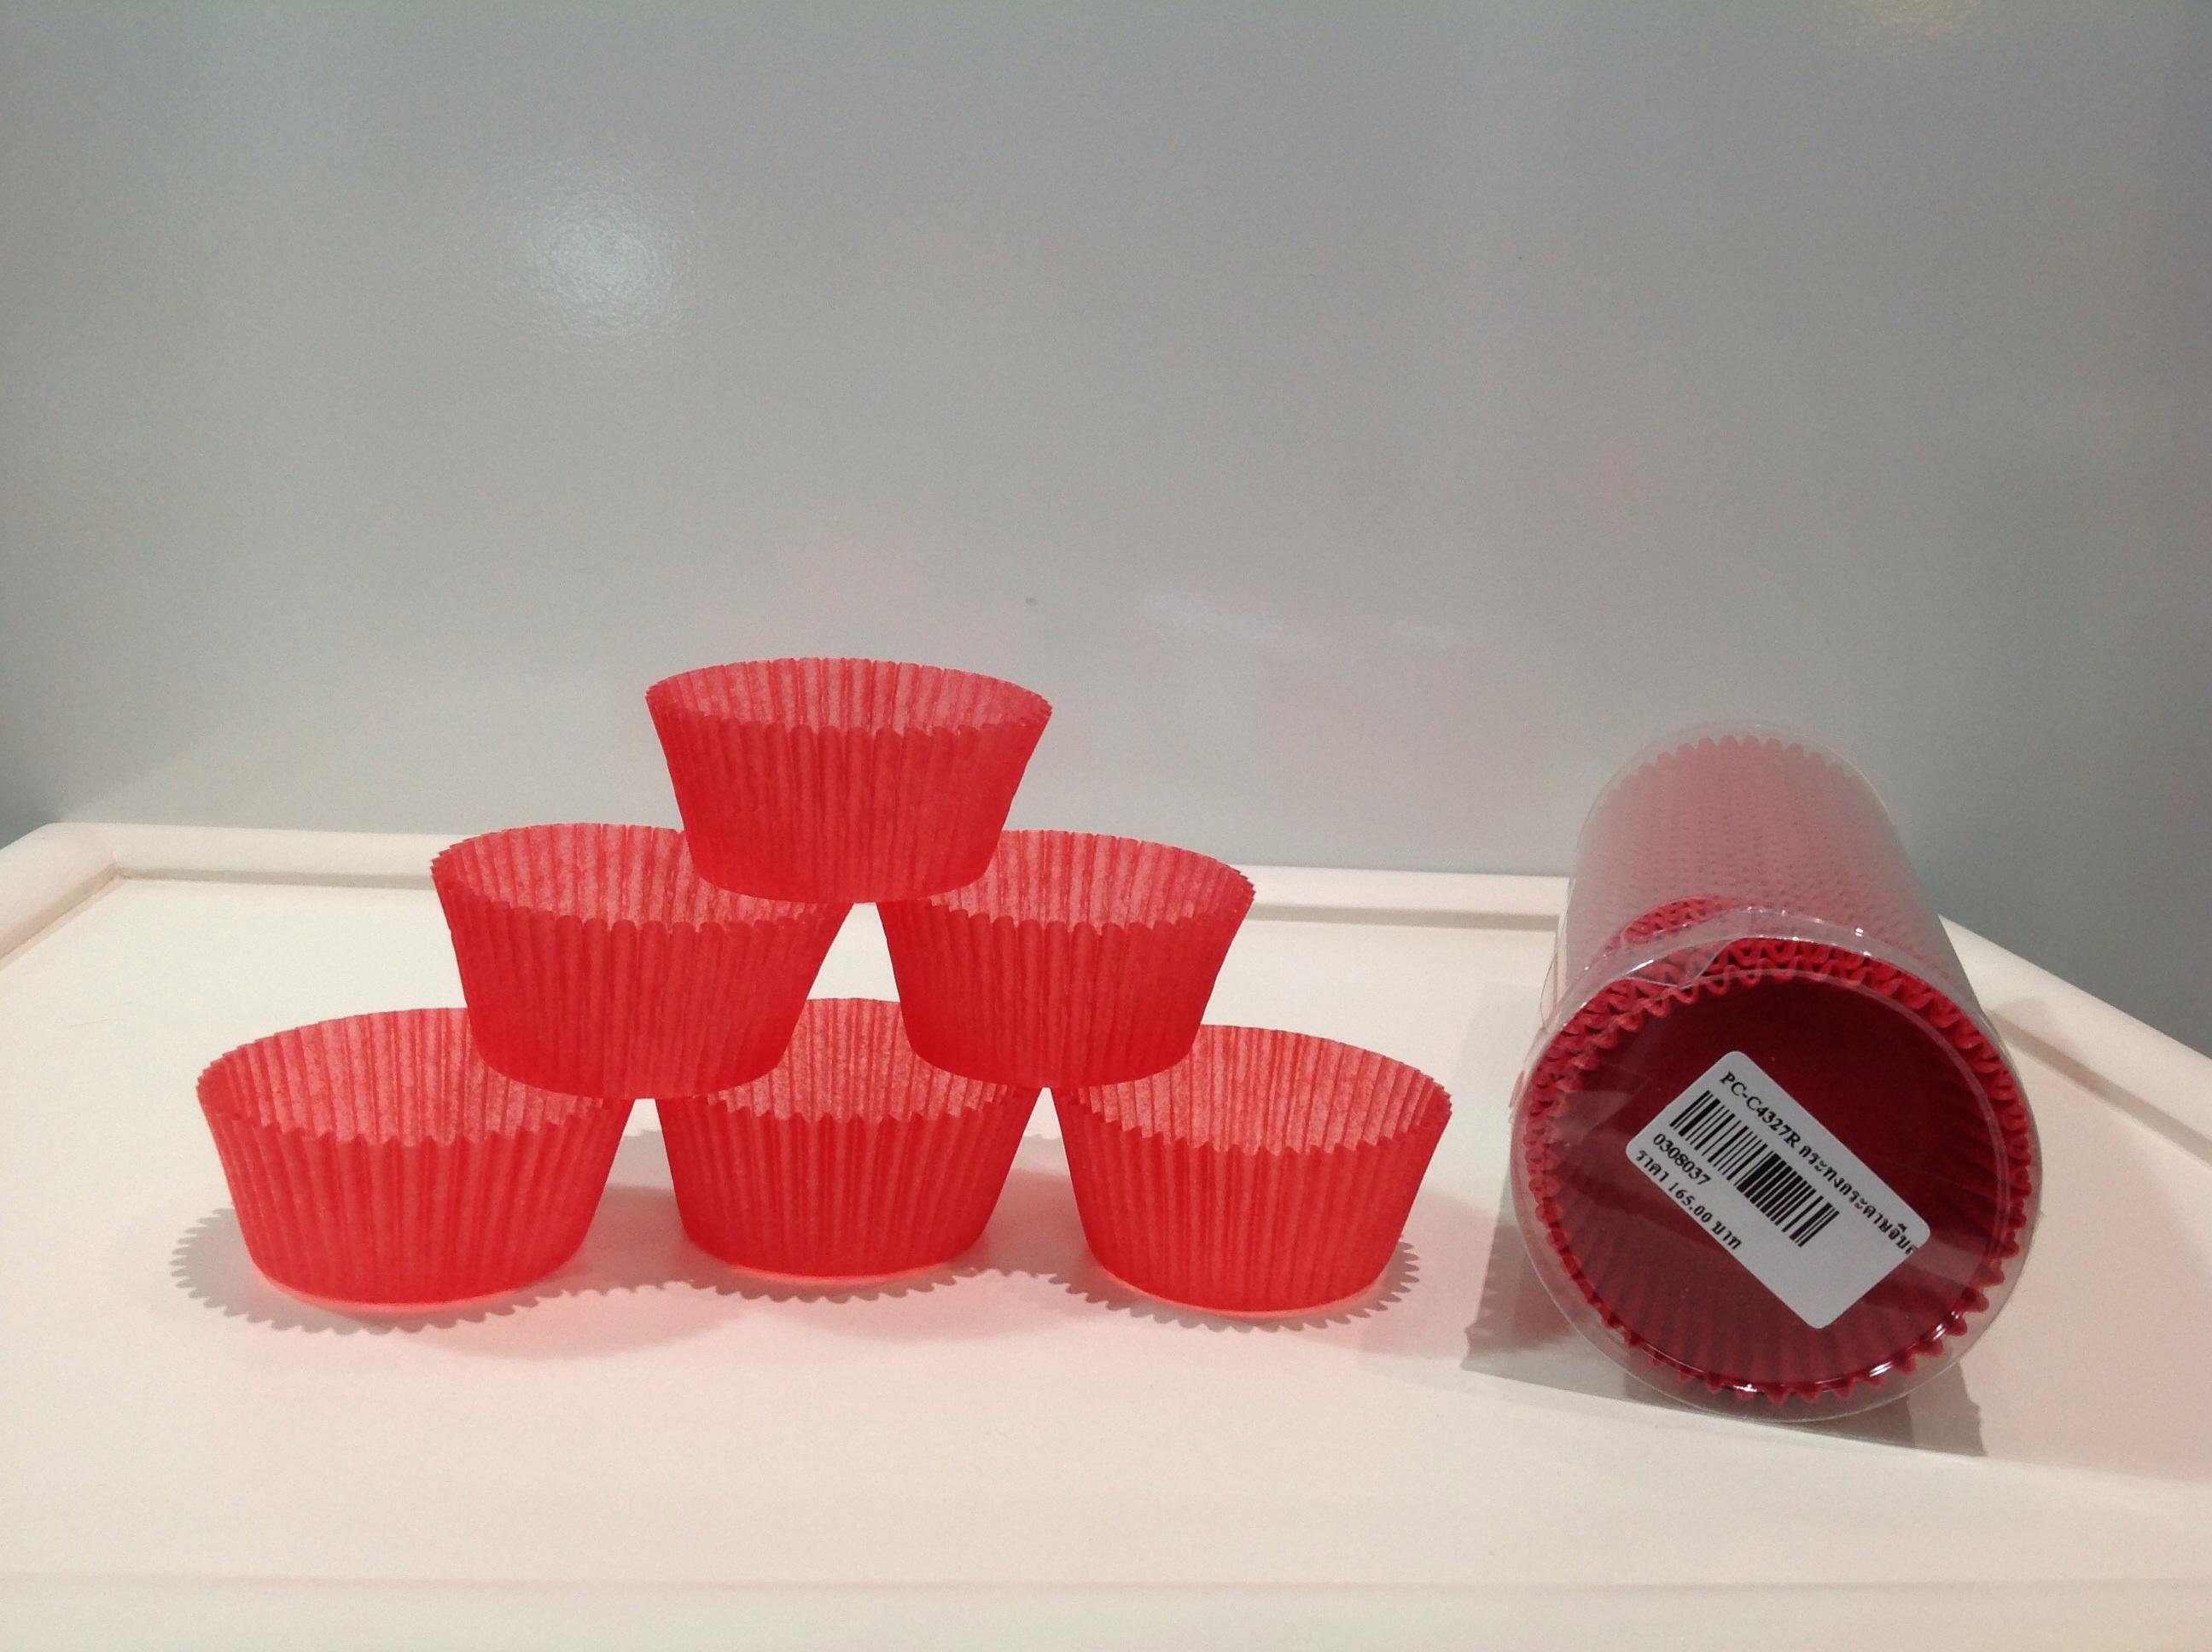 PC-C4327R กระทงกระดาษจีบสีแดง